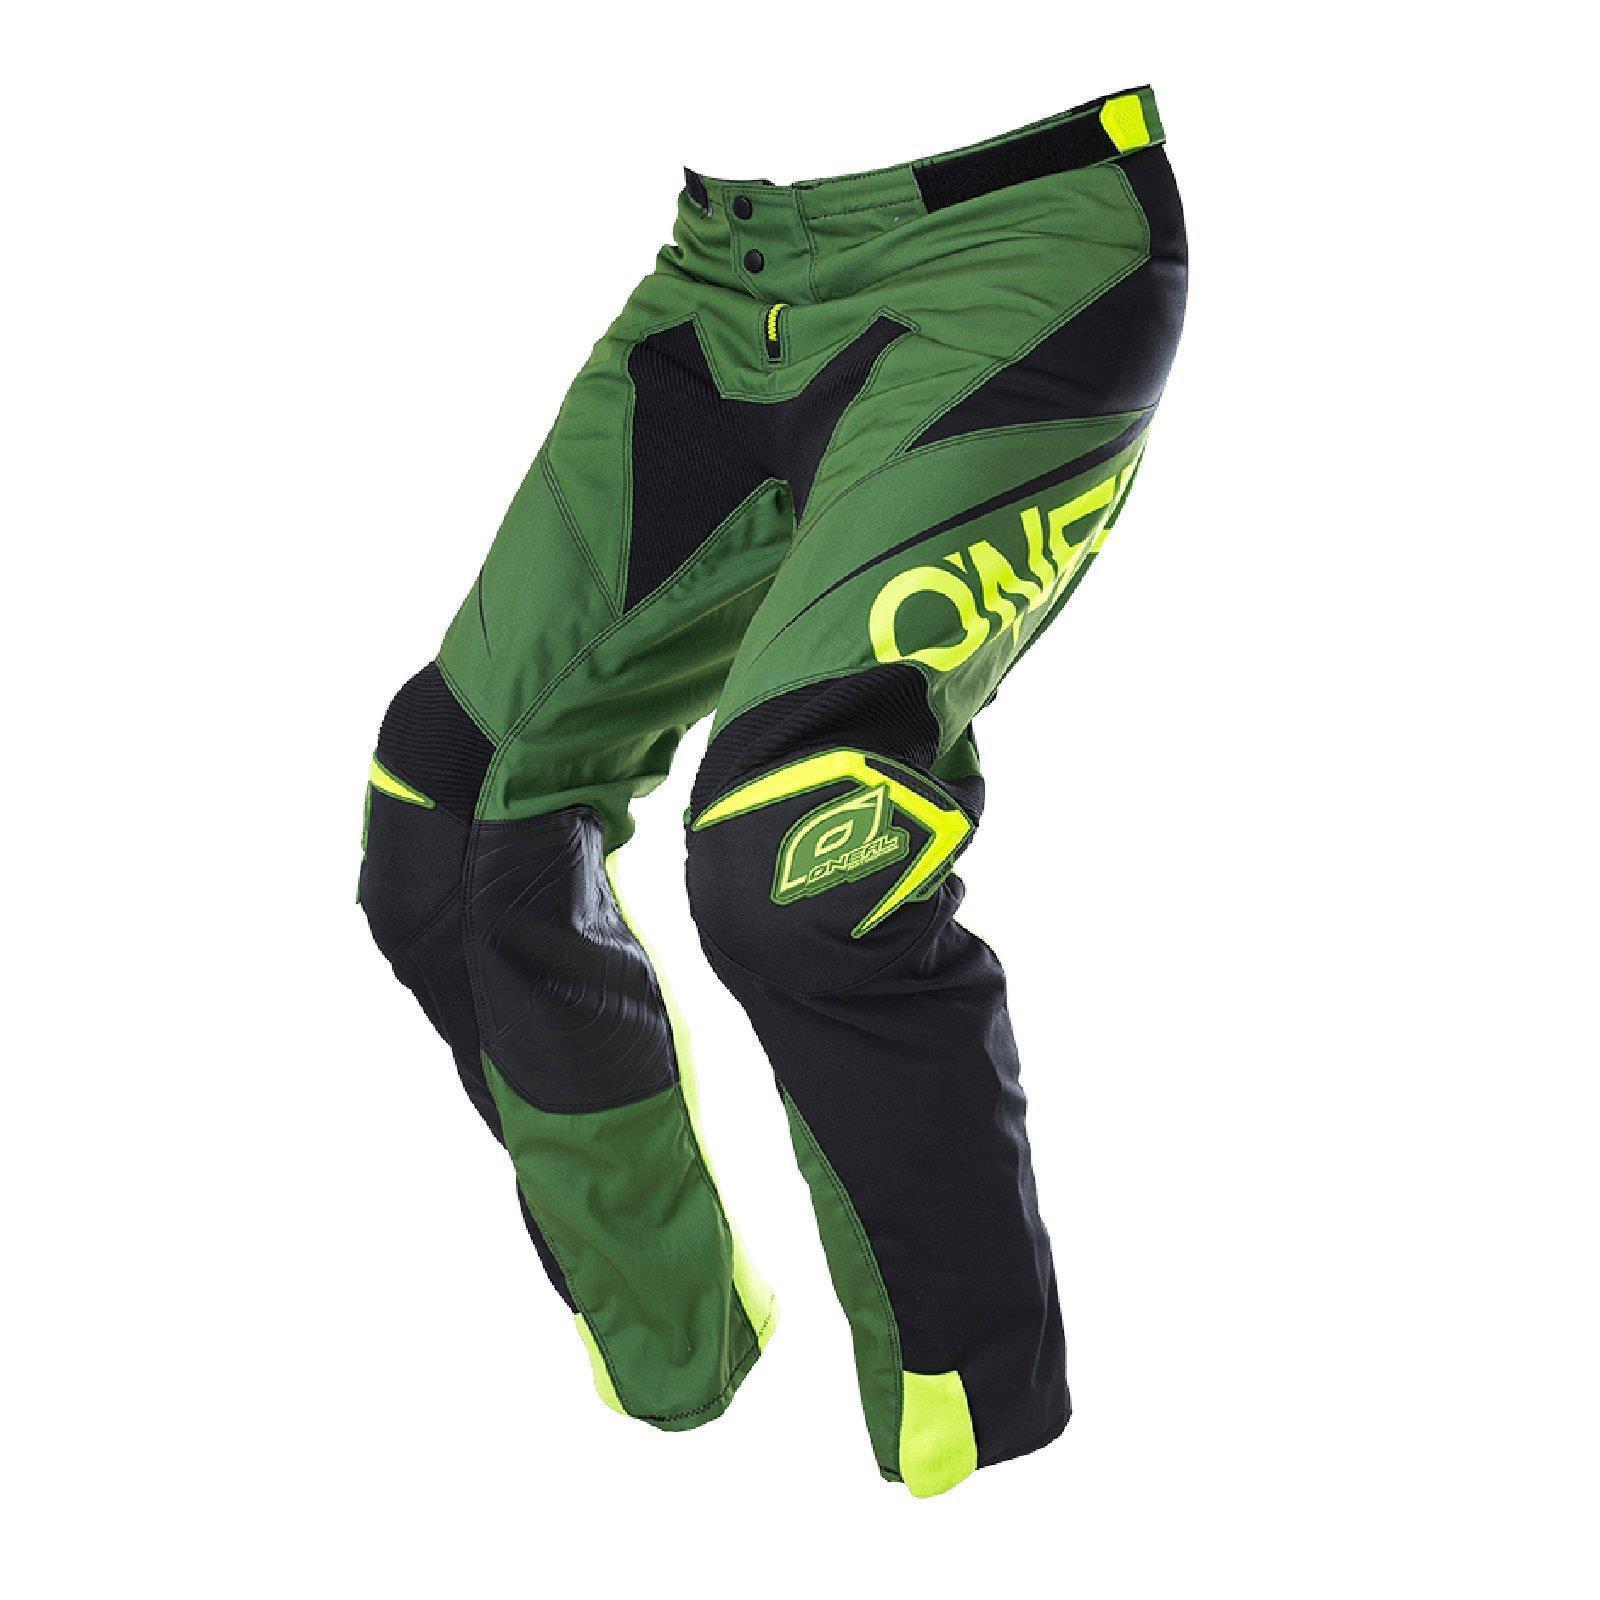 ONeal mayhem Lite pantalones bloqueador verde DH downhill bicicleta de montaña MTB FR Moto cross